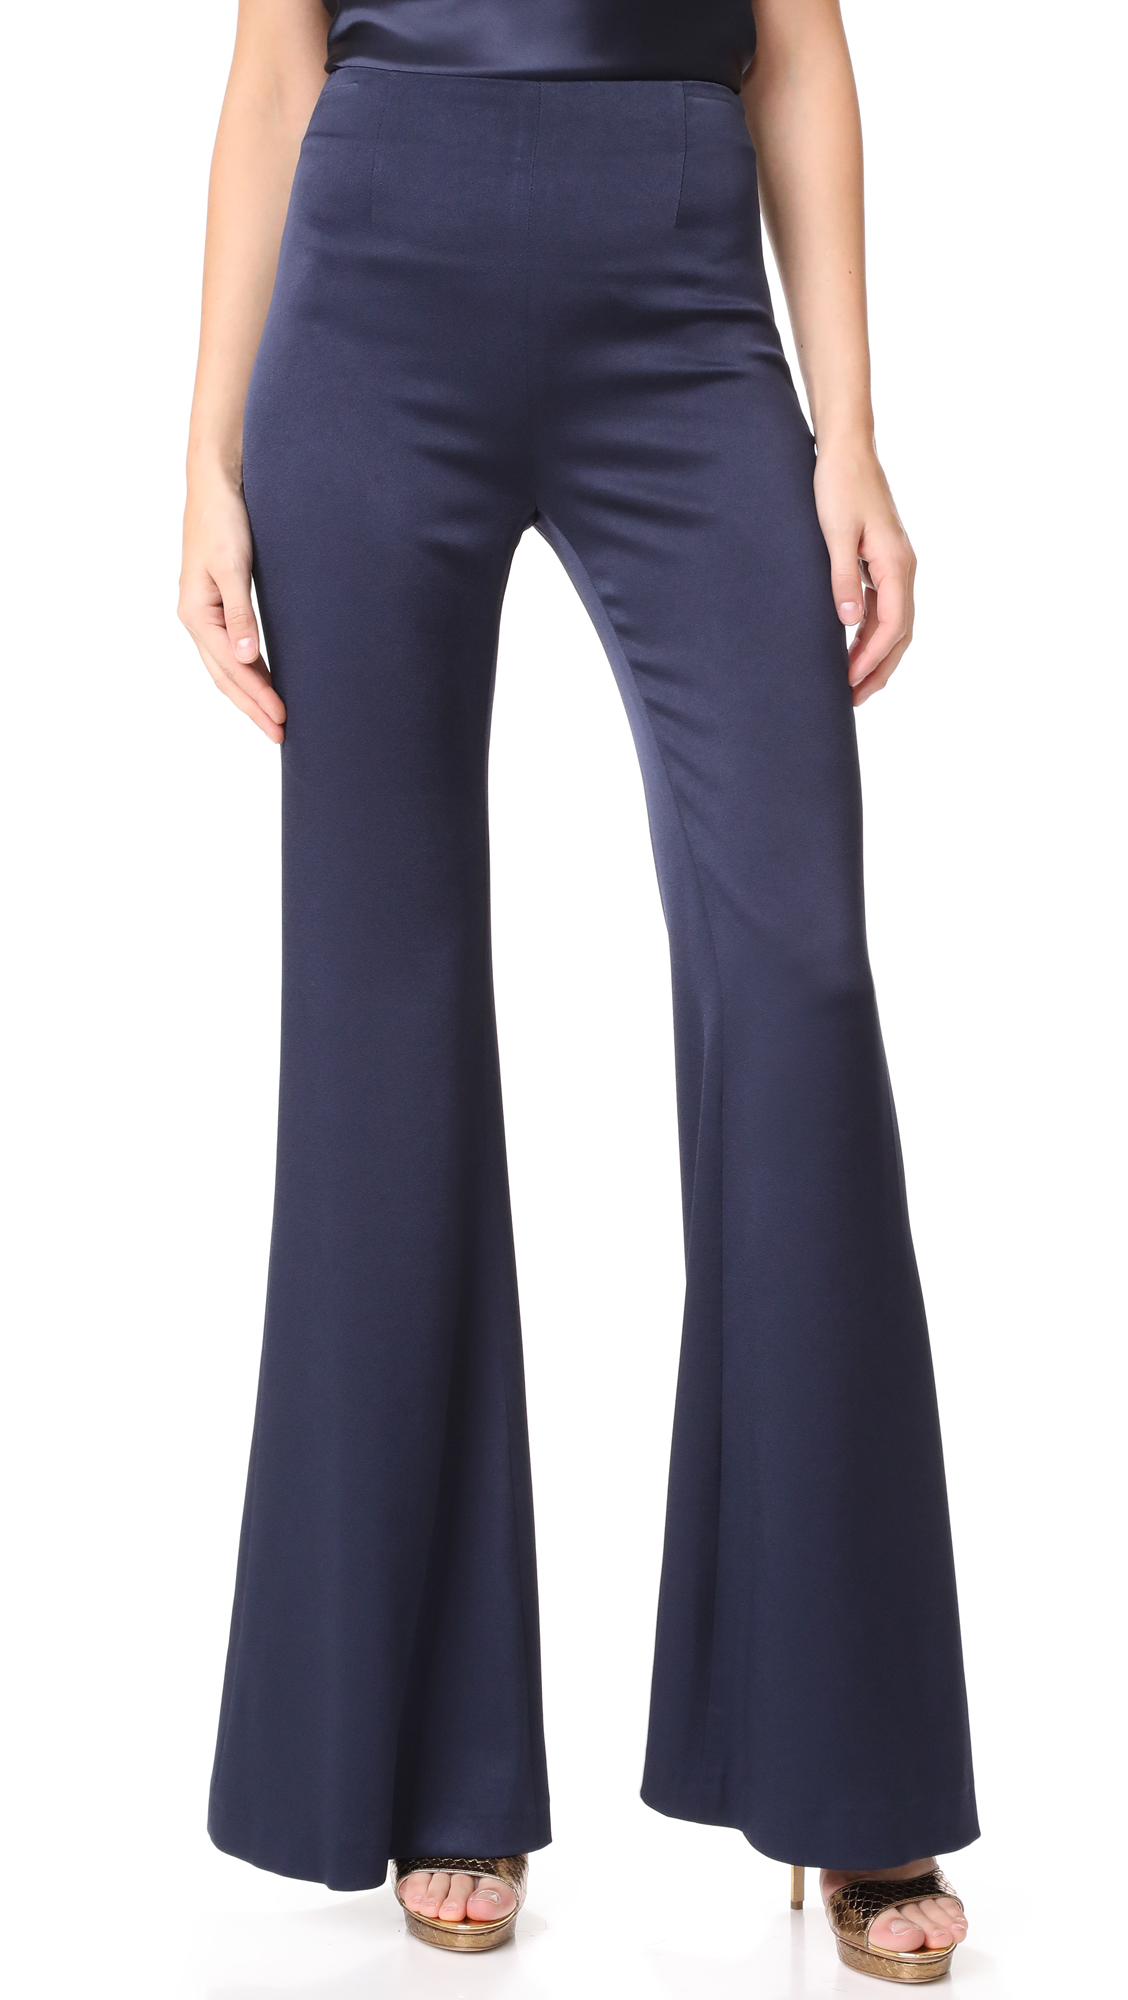 Galvan London High Waisted Satin Trousers